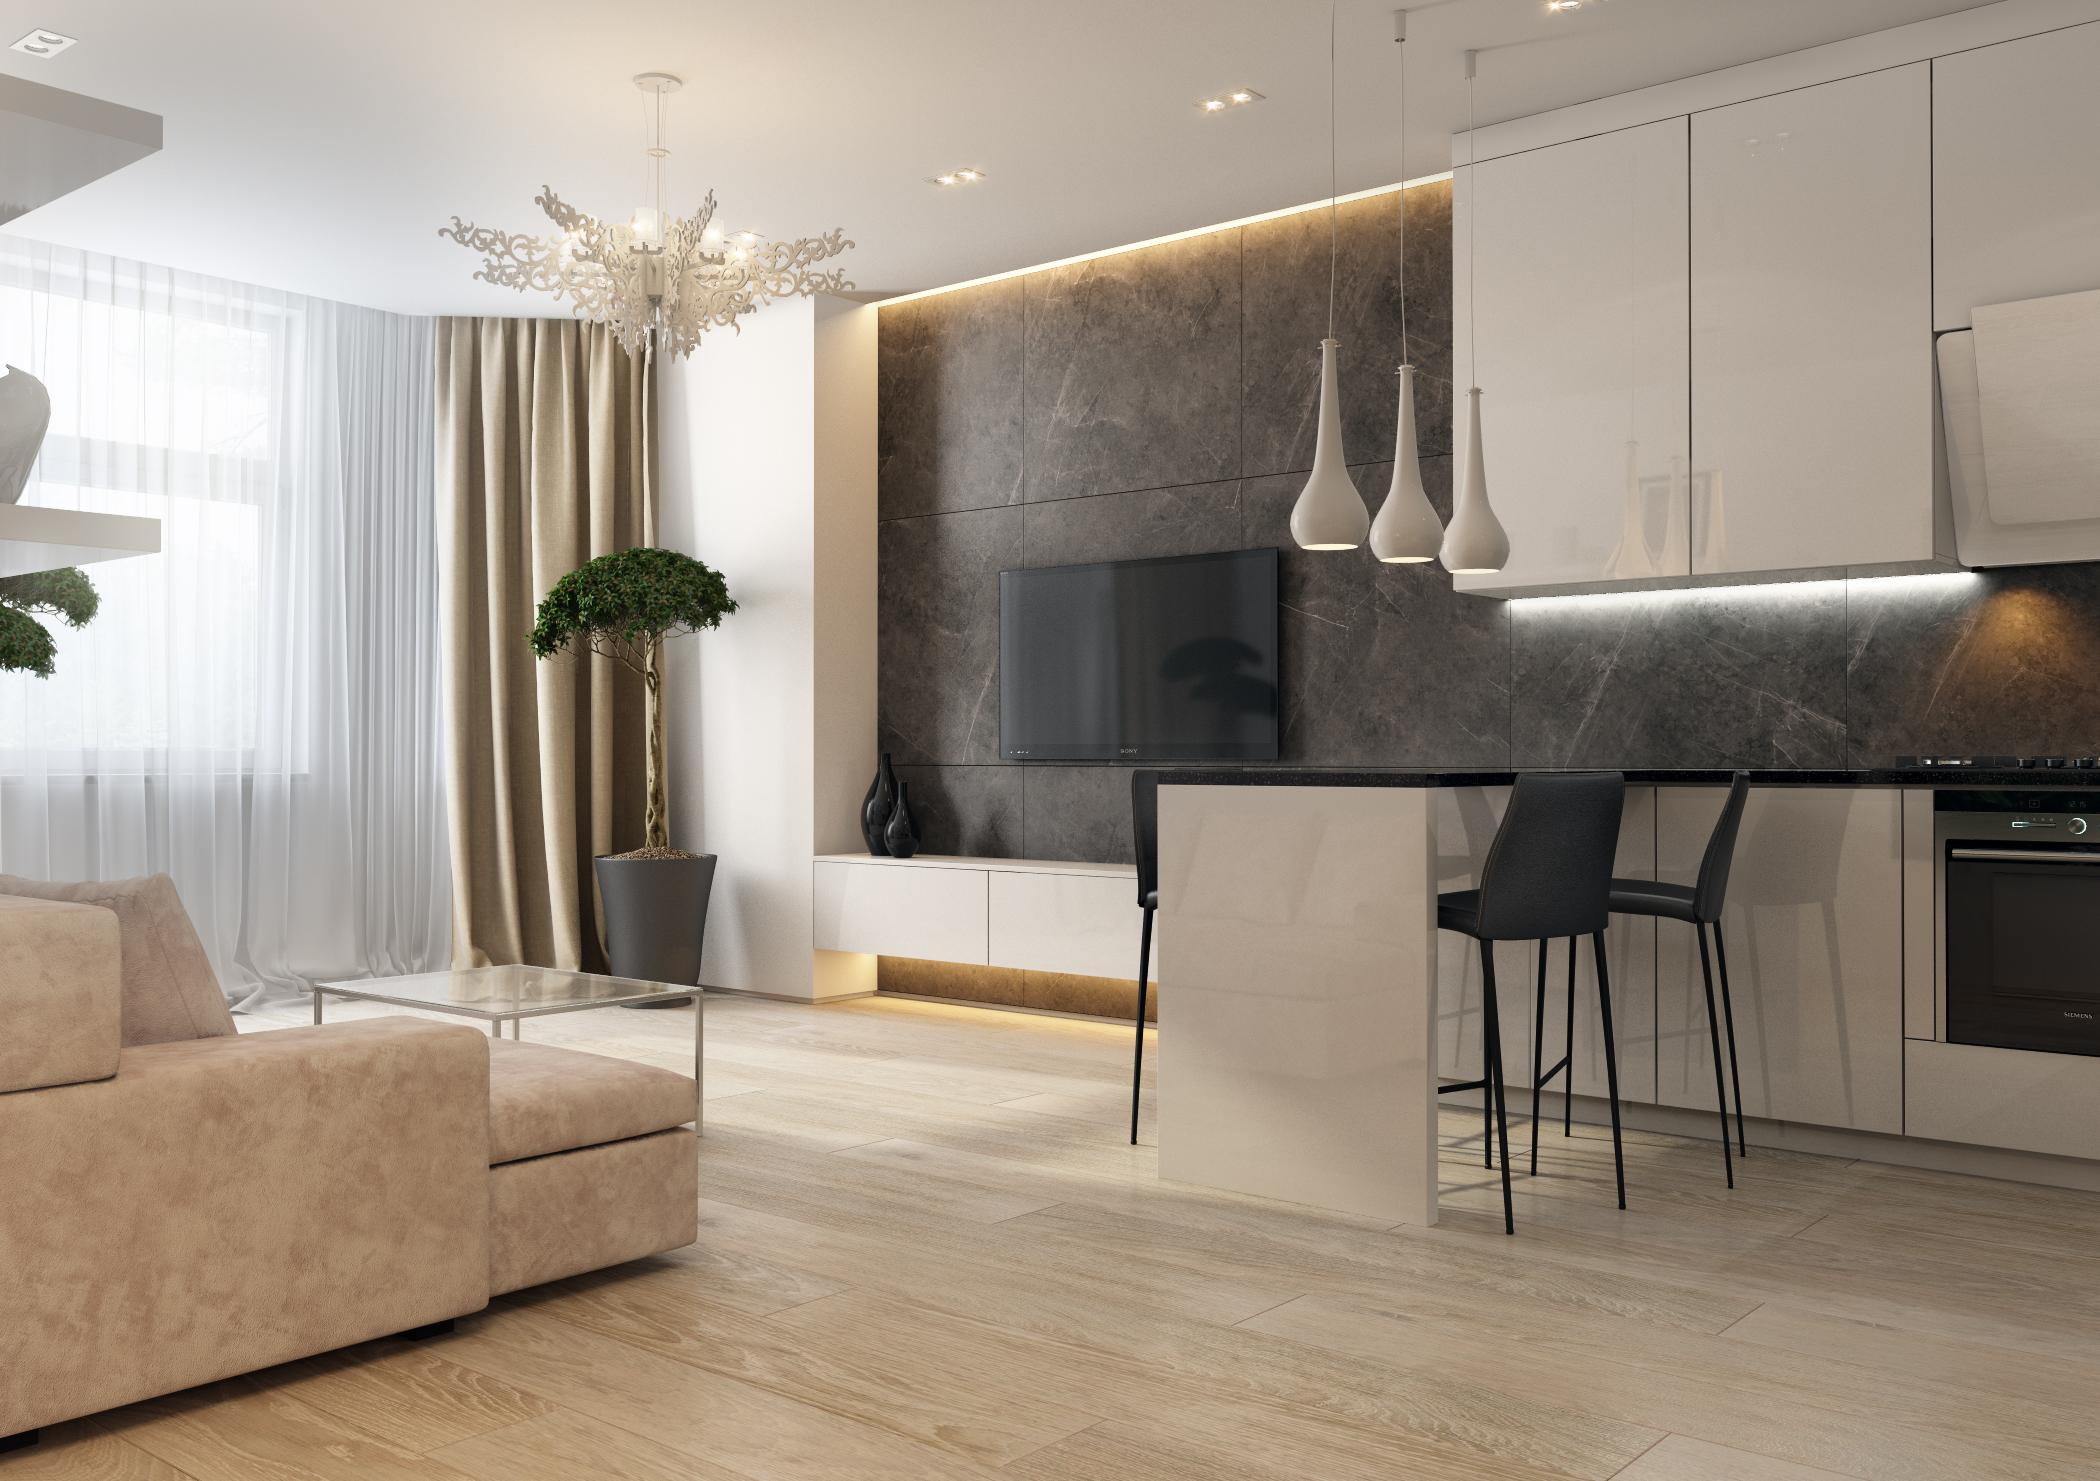 design minimalism style